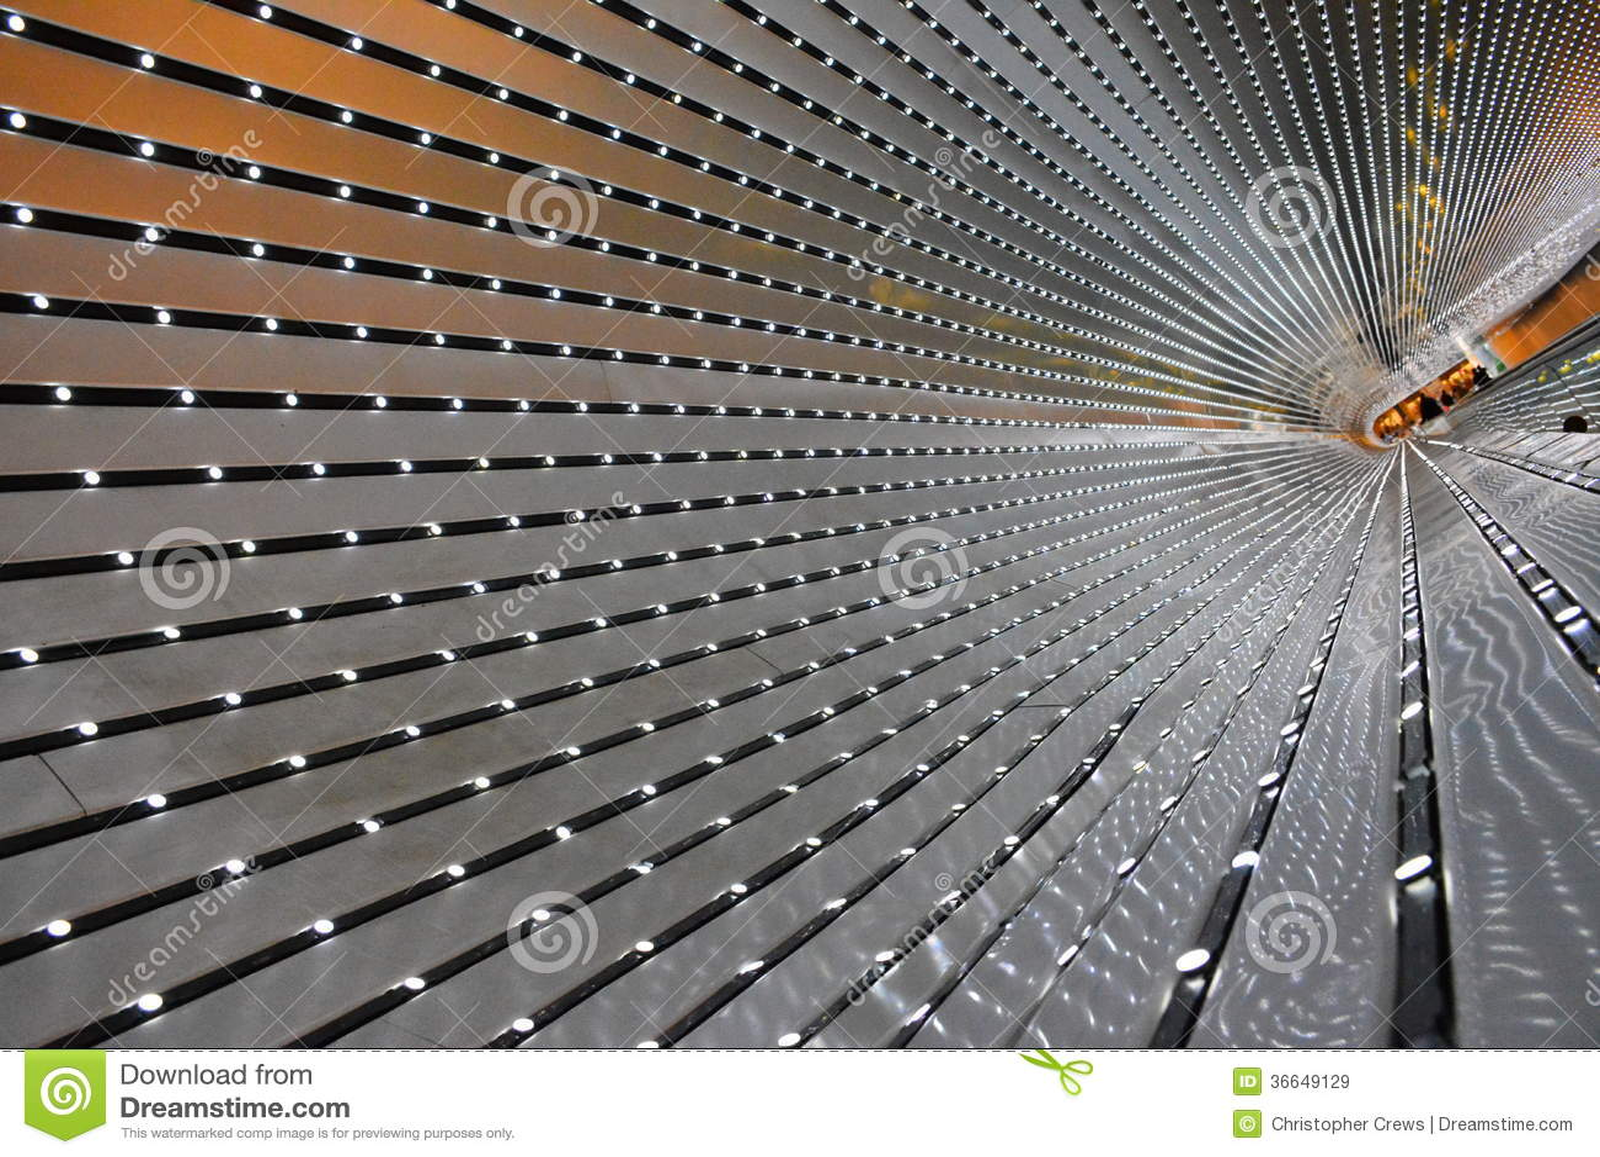 National Gallery της τέχνης, κινούμενη διάβαση πεζών.